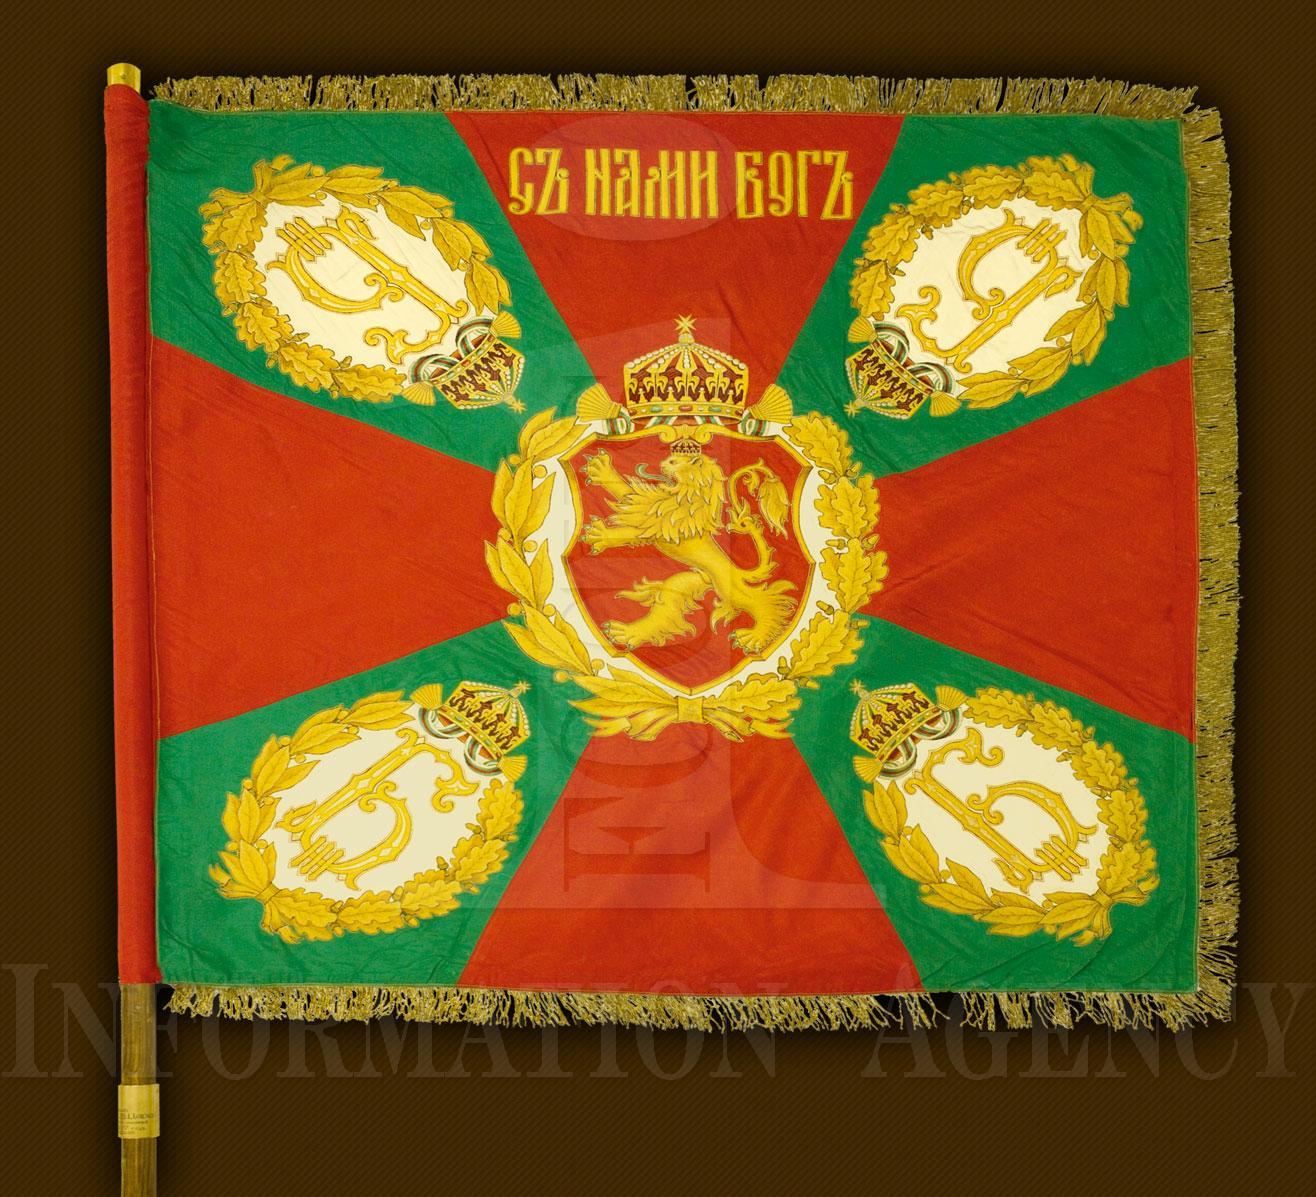 Военното на Негово Величество Училище знаме